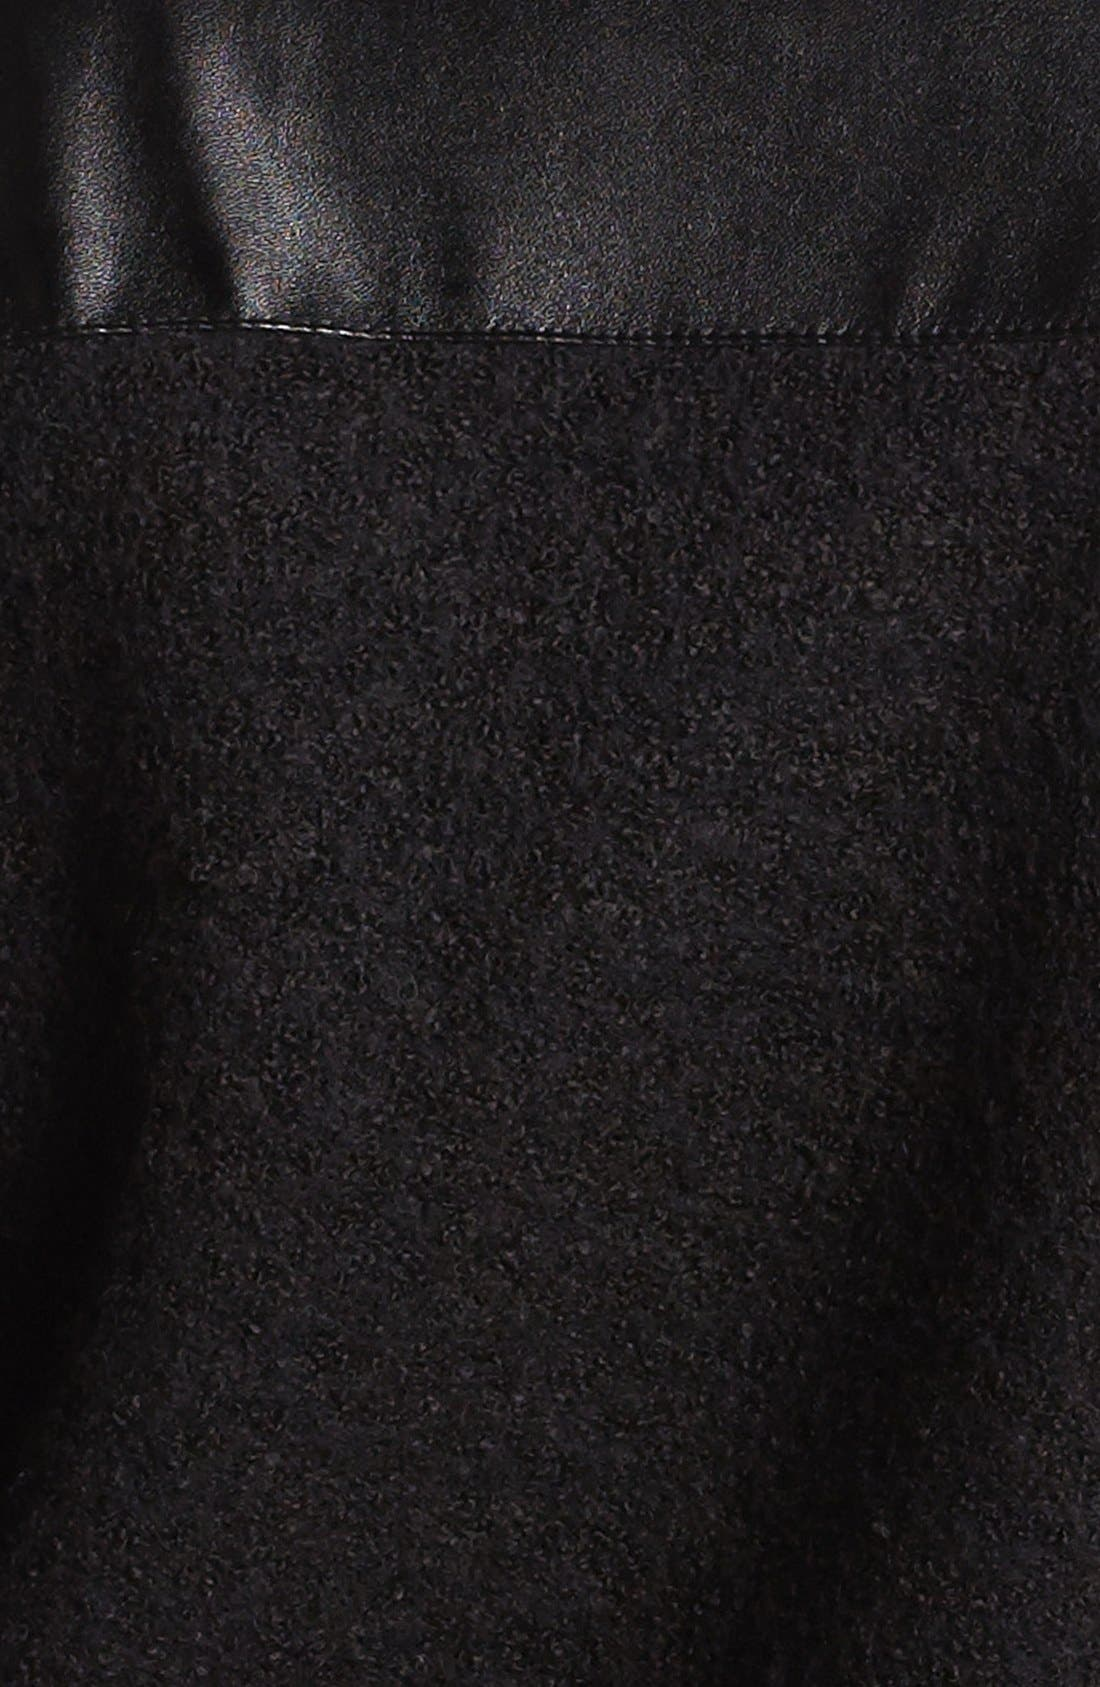 Bouclé Knit Bomber Jacket,                             Alternate thumbnail 2, color,                             001